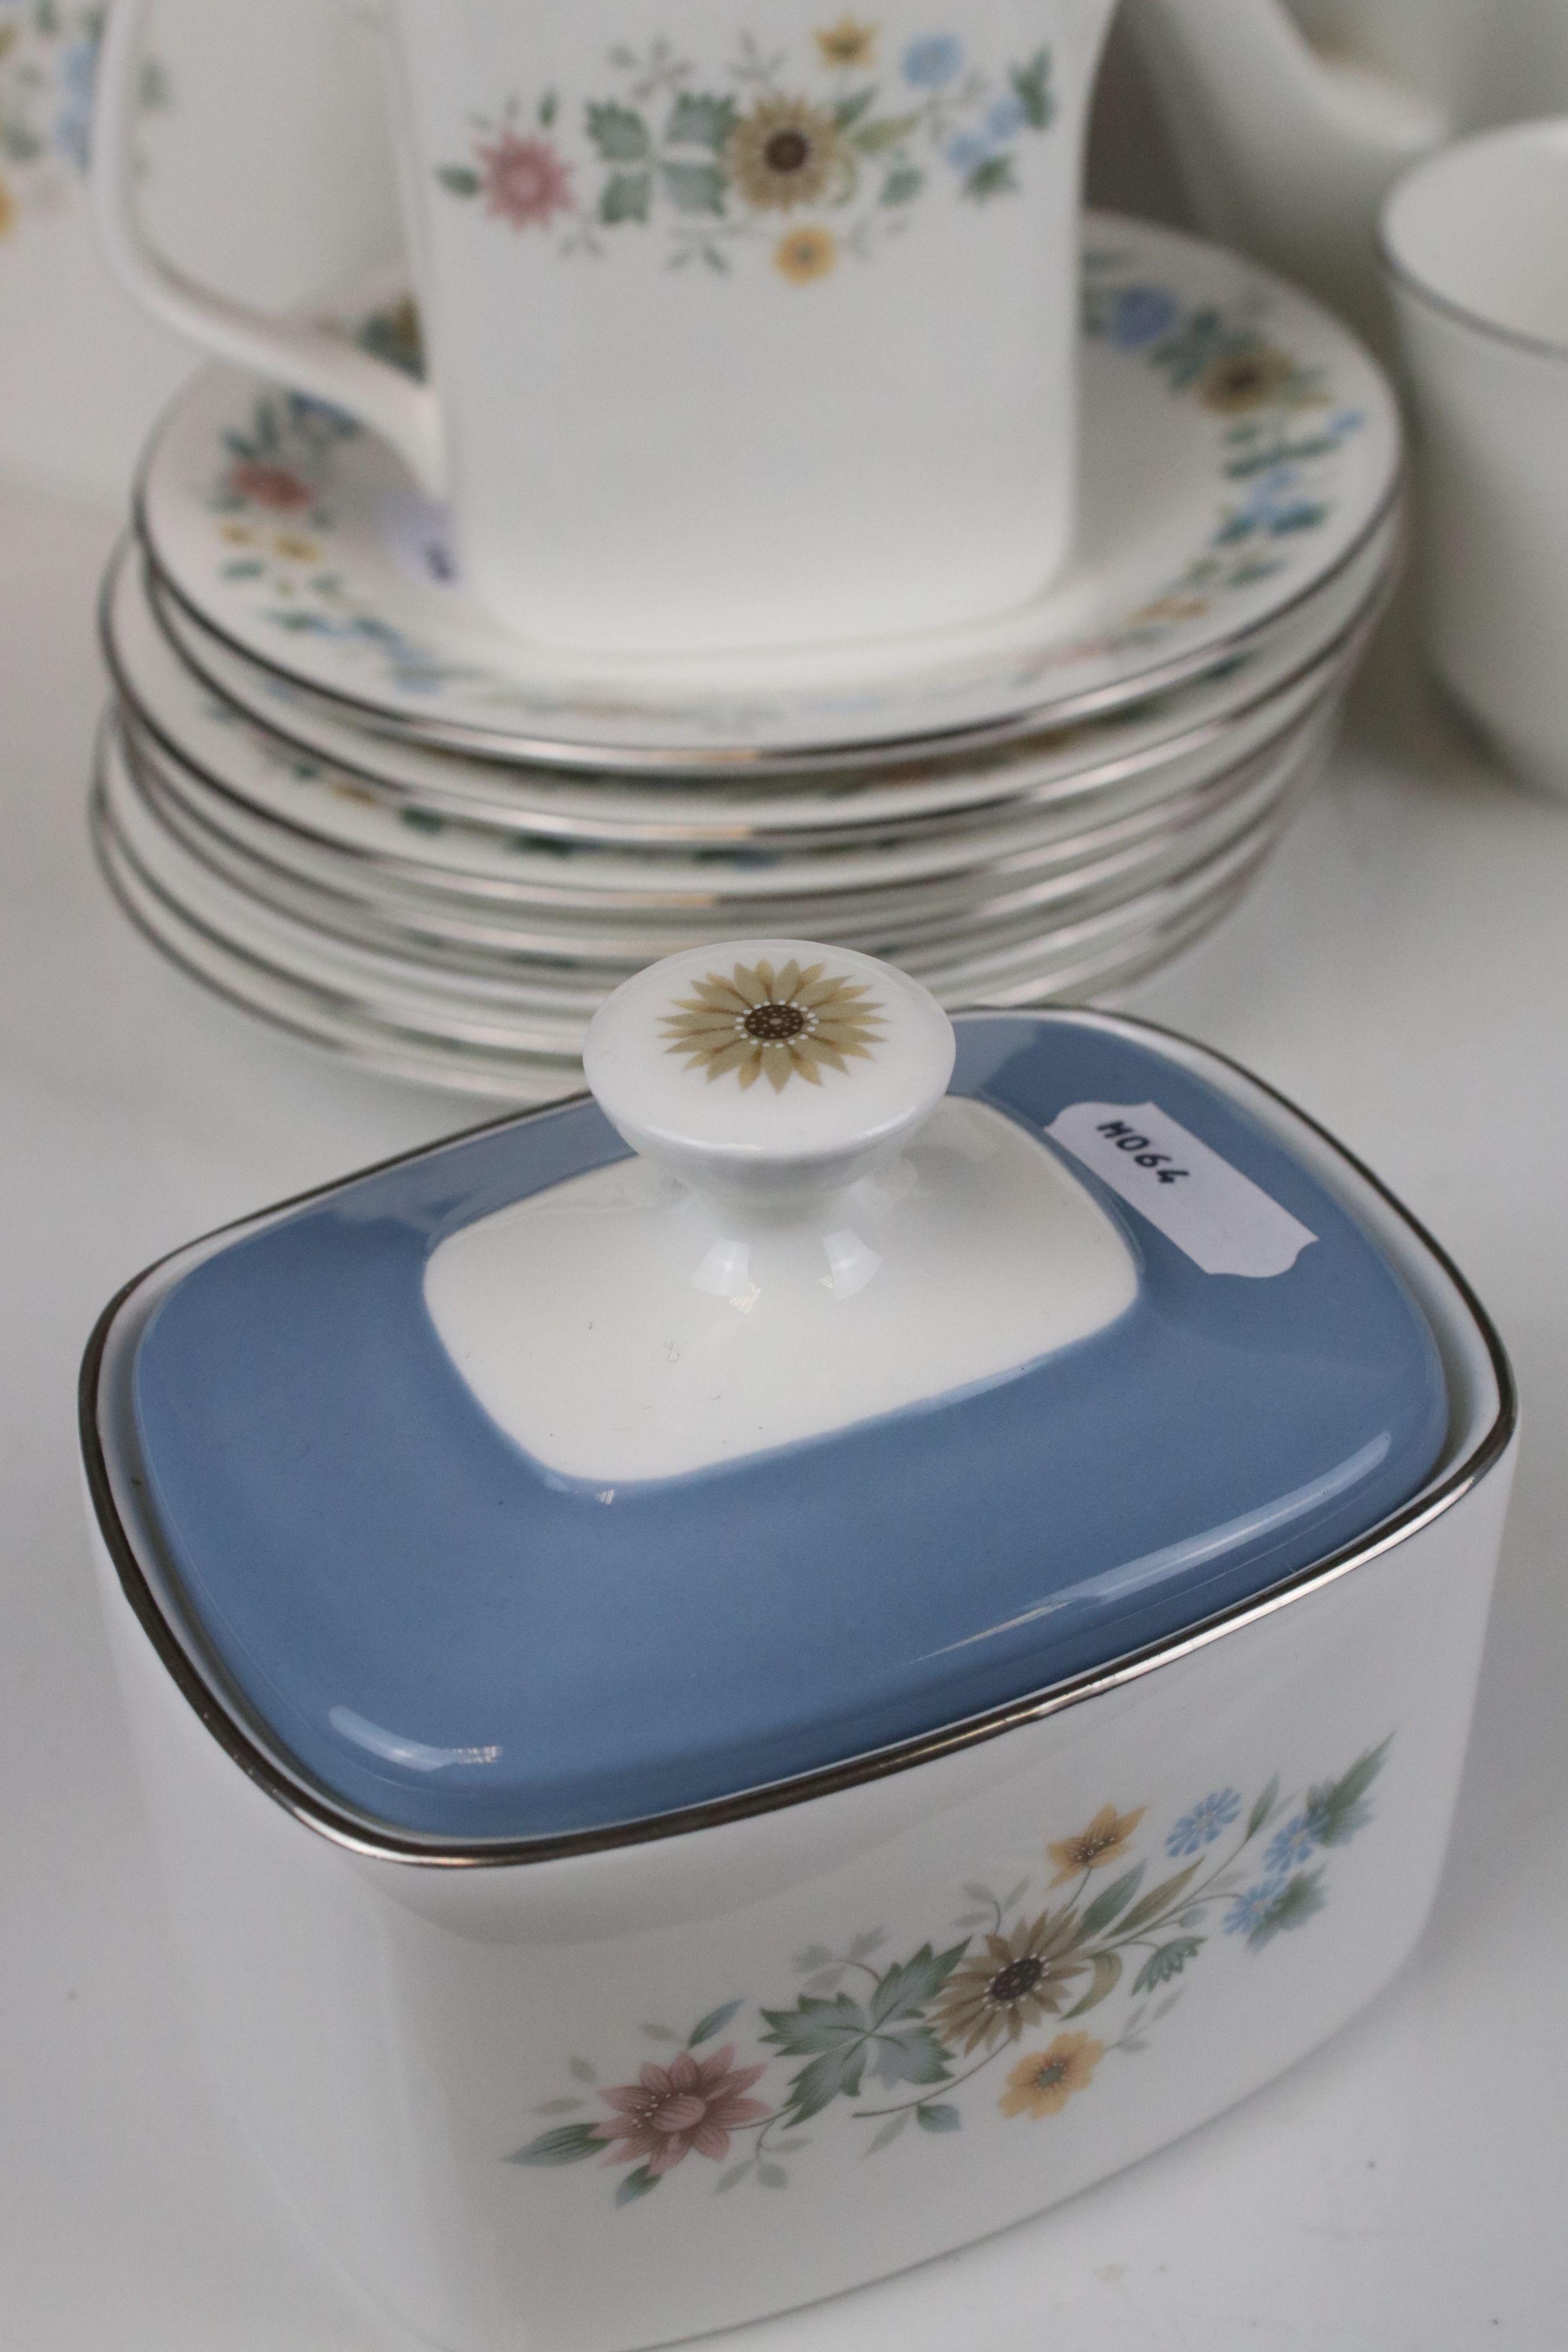 Royal Doulton ' Pastorale ' Tea Set comprising Two Teapots, Milk, Sugar, 6 Cups and 7 Saucers - Image 6 of 7